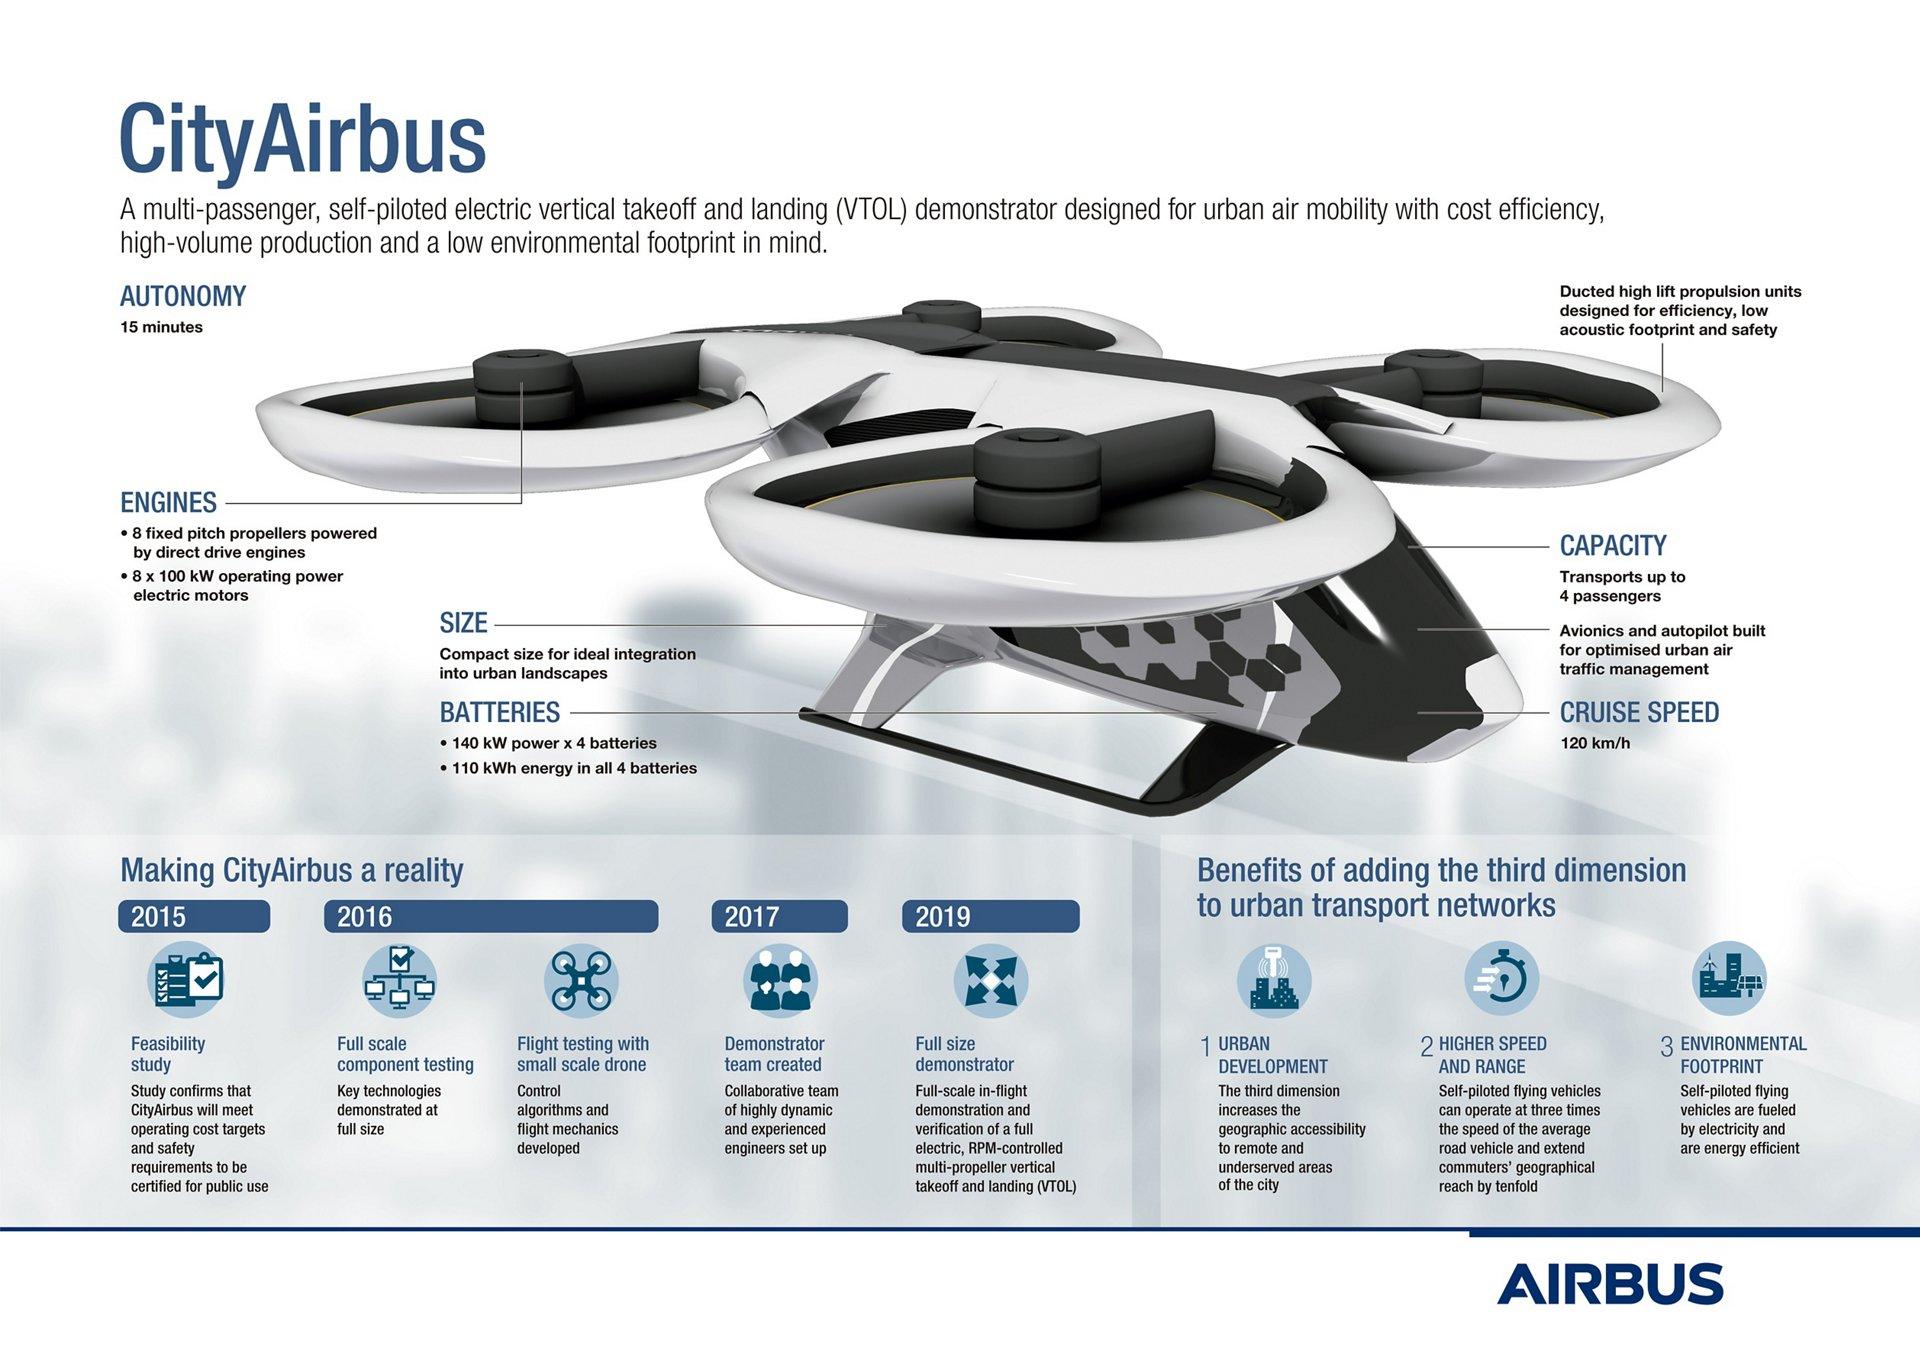 20190123-CityAirbus-infographic